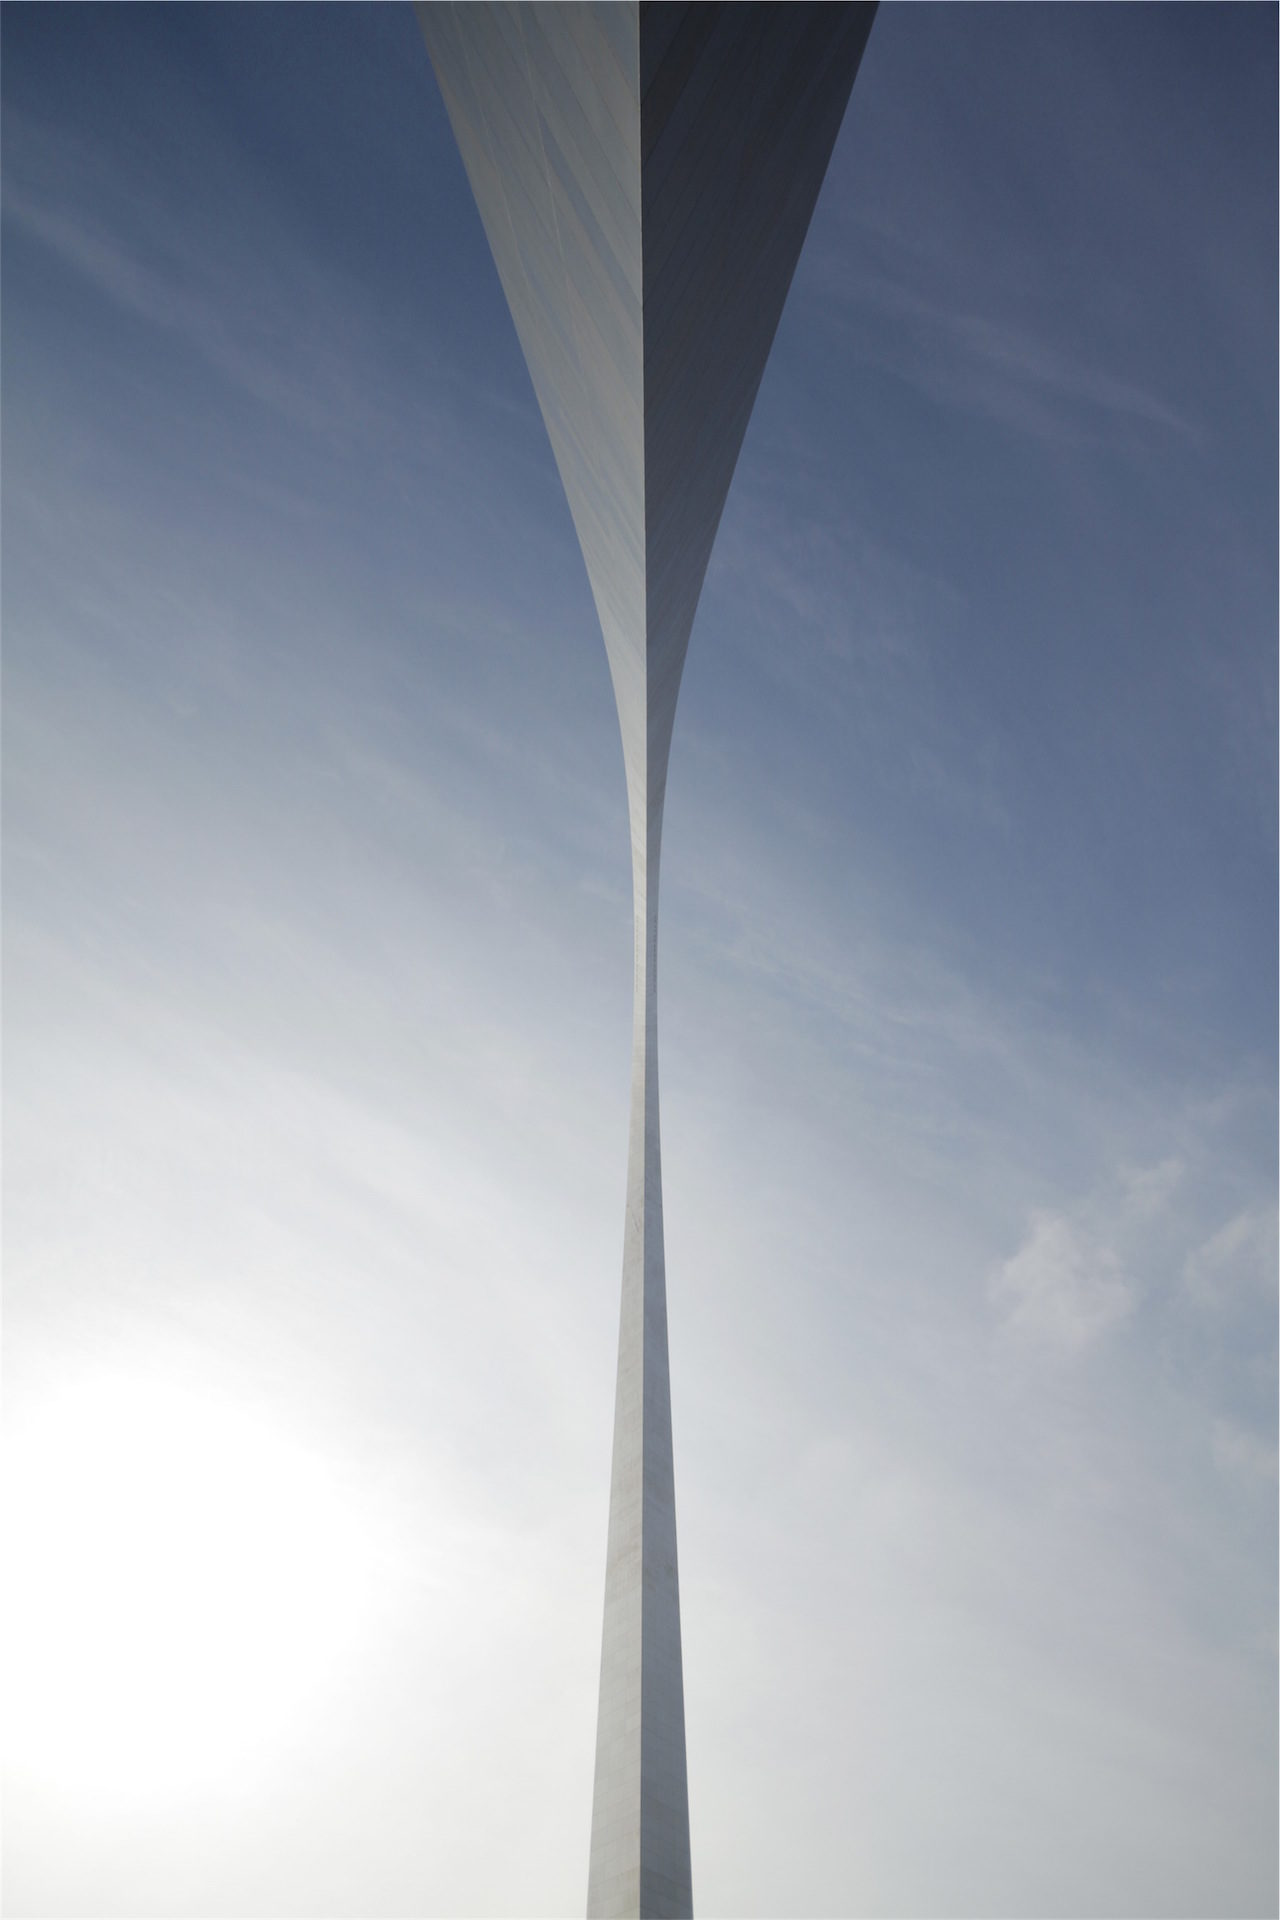 puerte, चाप, construcción, आकाश, सूर्य - HD वॉलपेपर - प्रोफेसर-falken.com